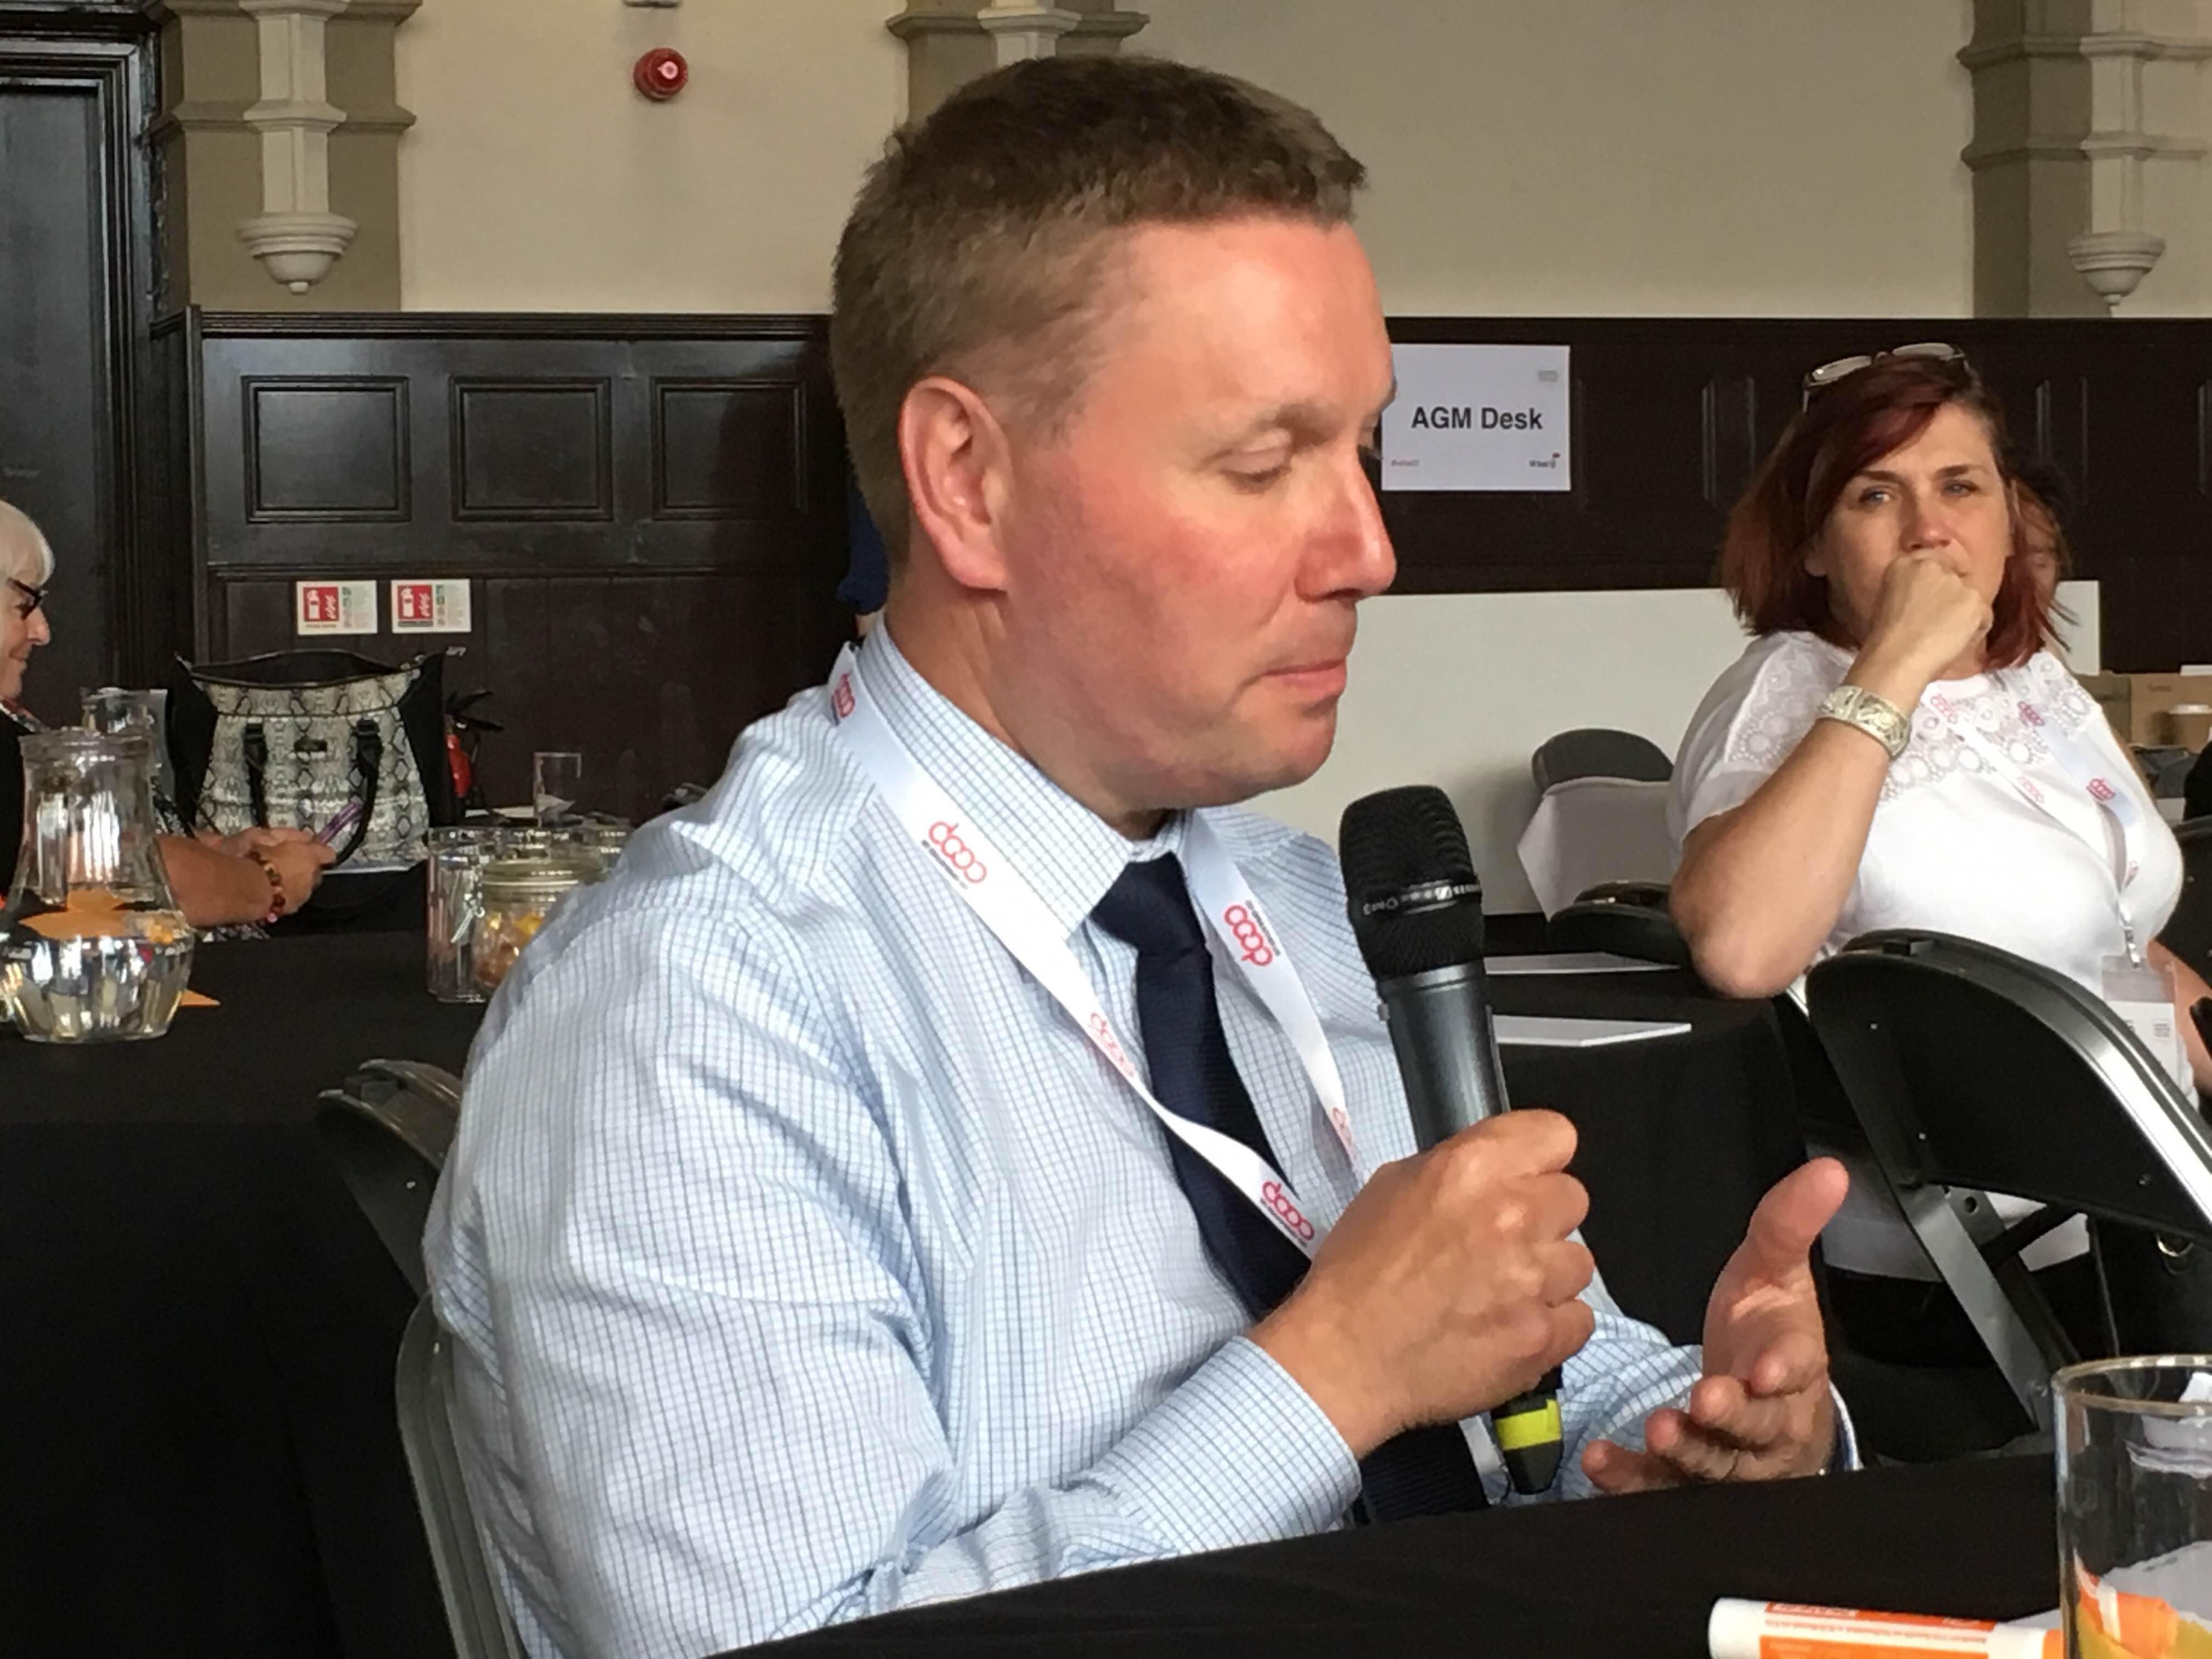 Jim Watts, Secretary, Central England Co-operative